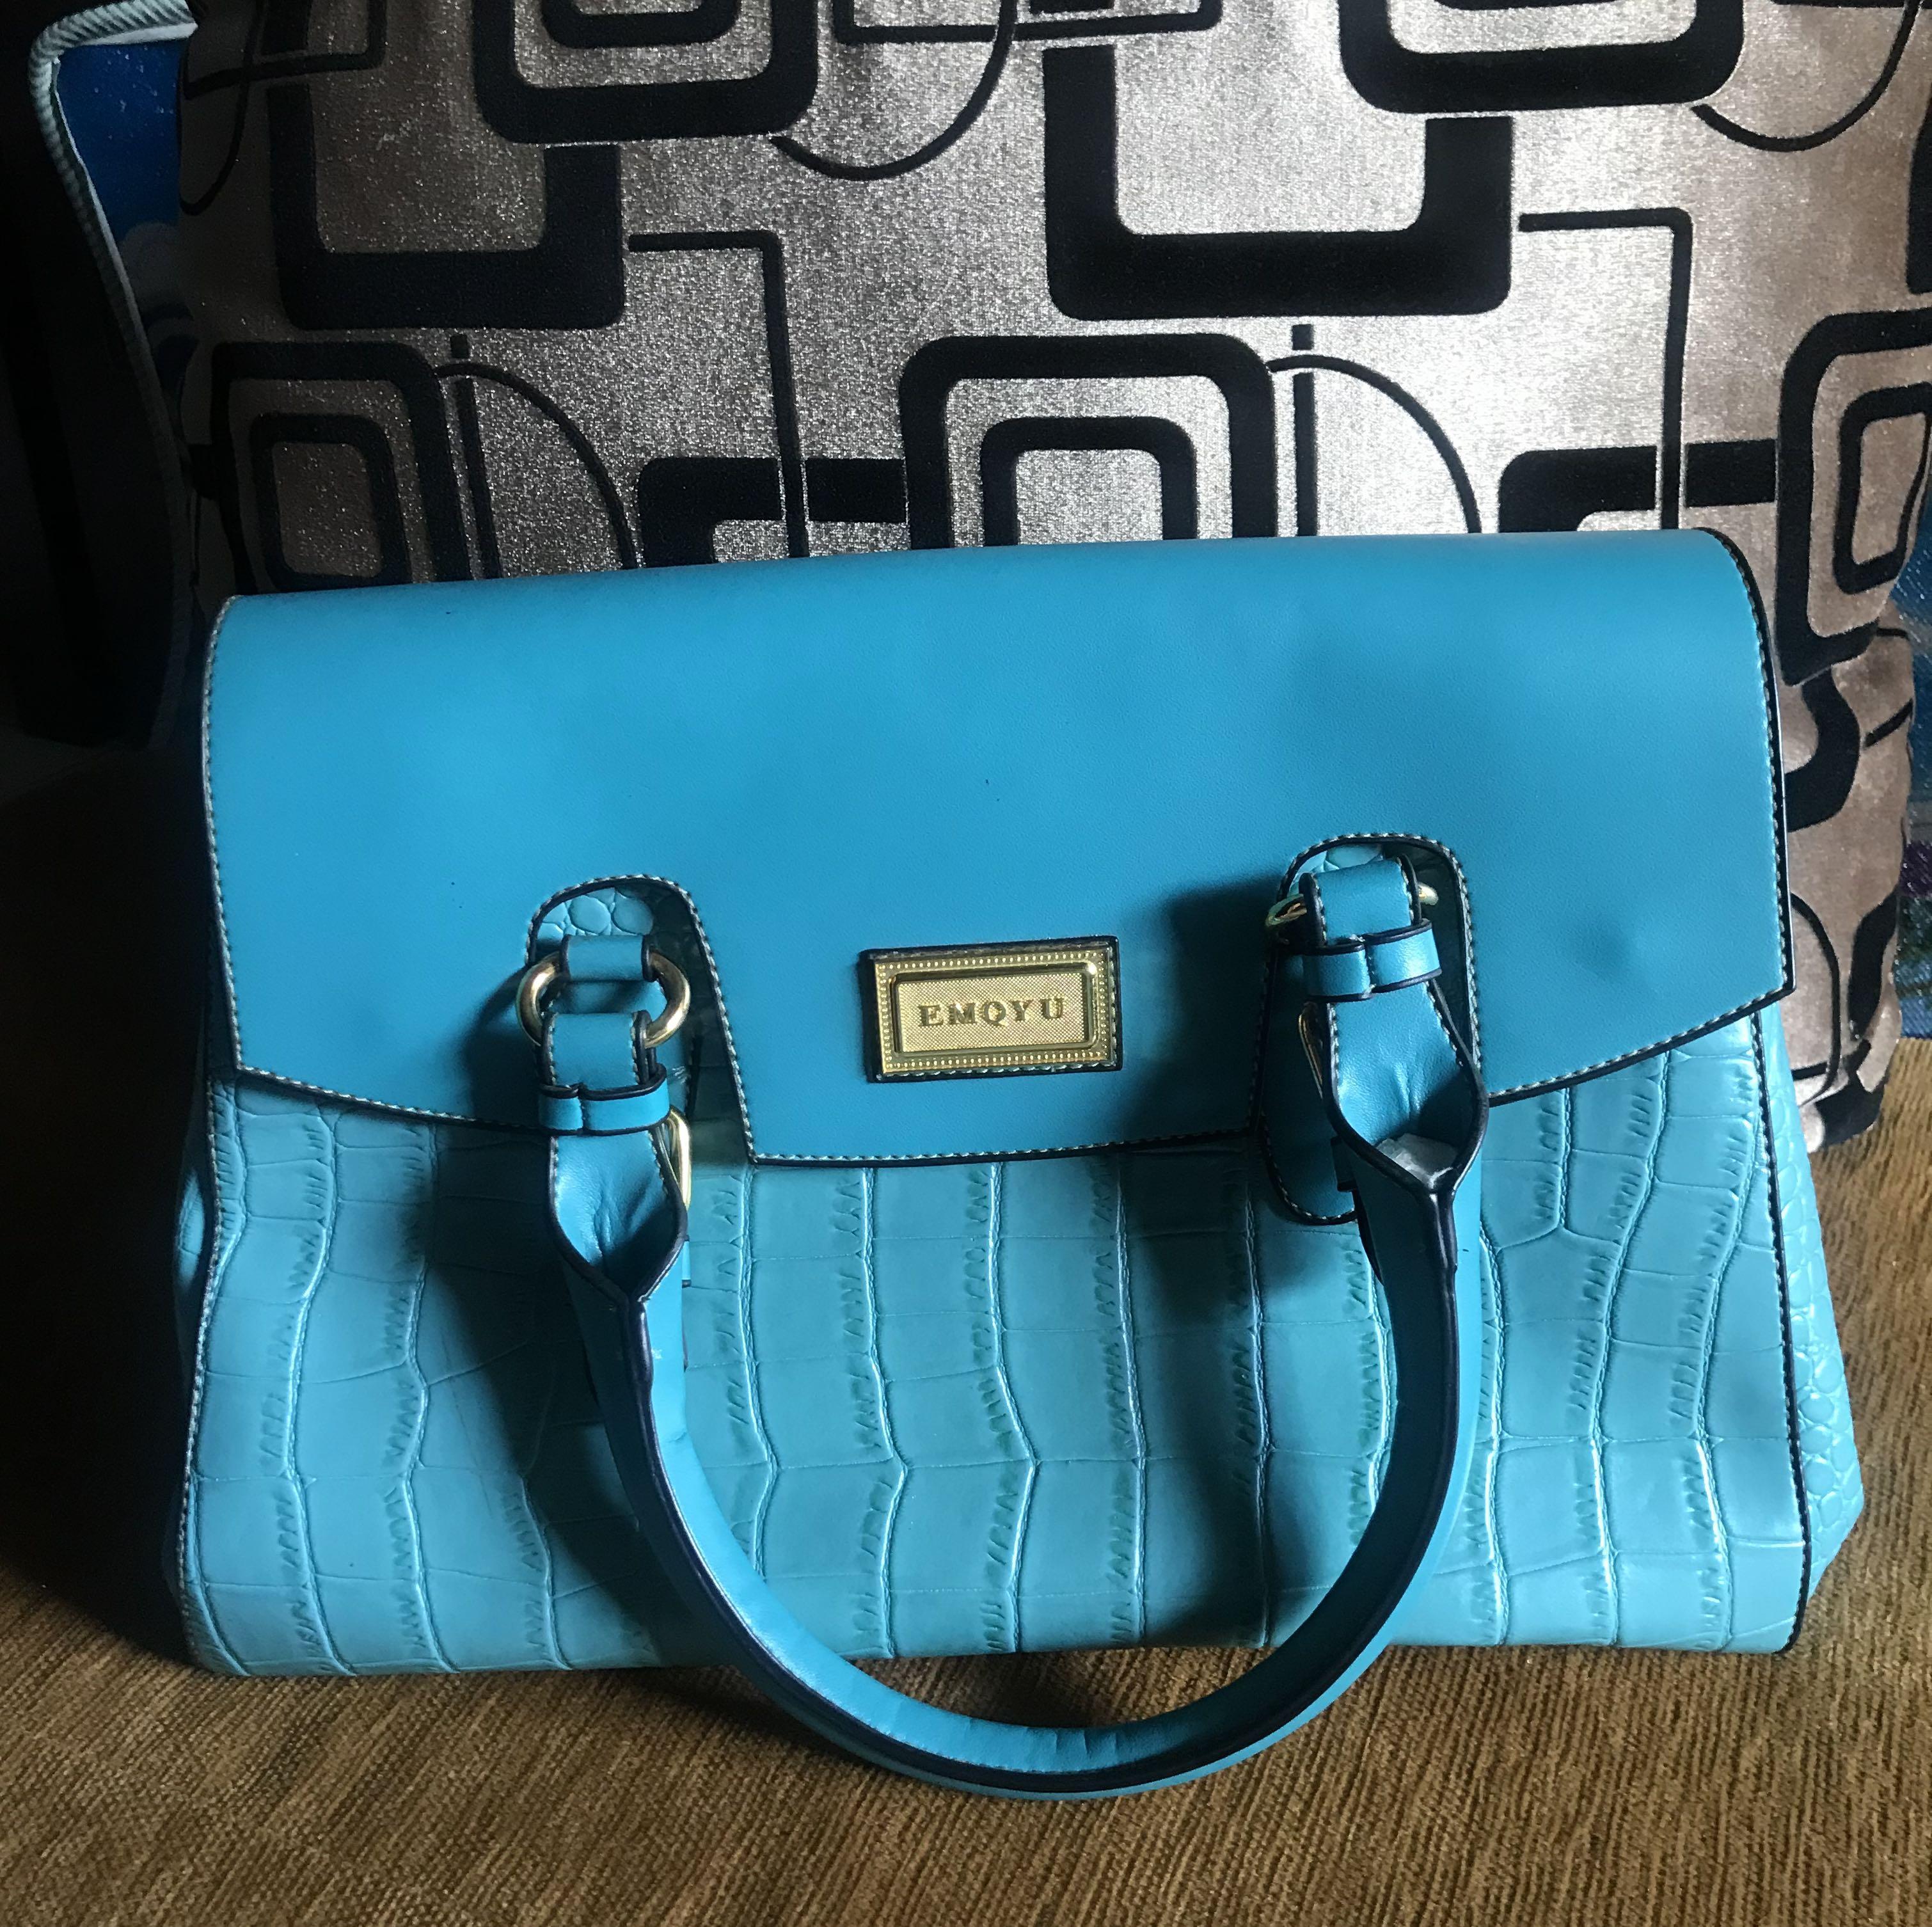 Ala Hermes Brand Emqyu Hand Bag